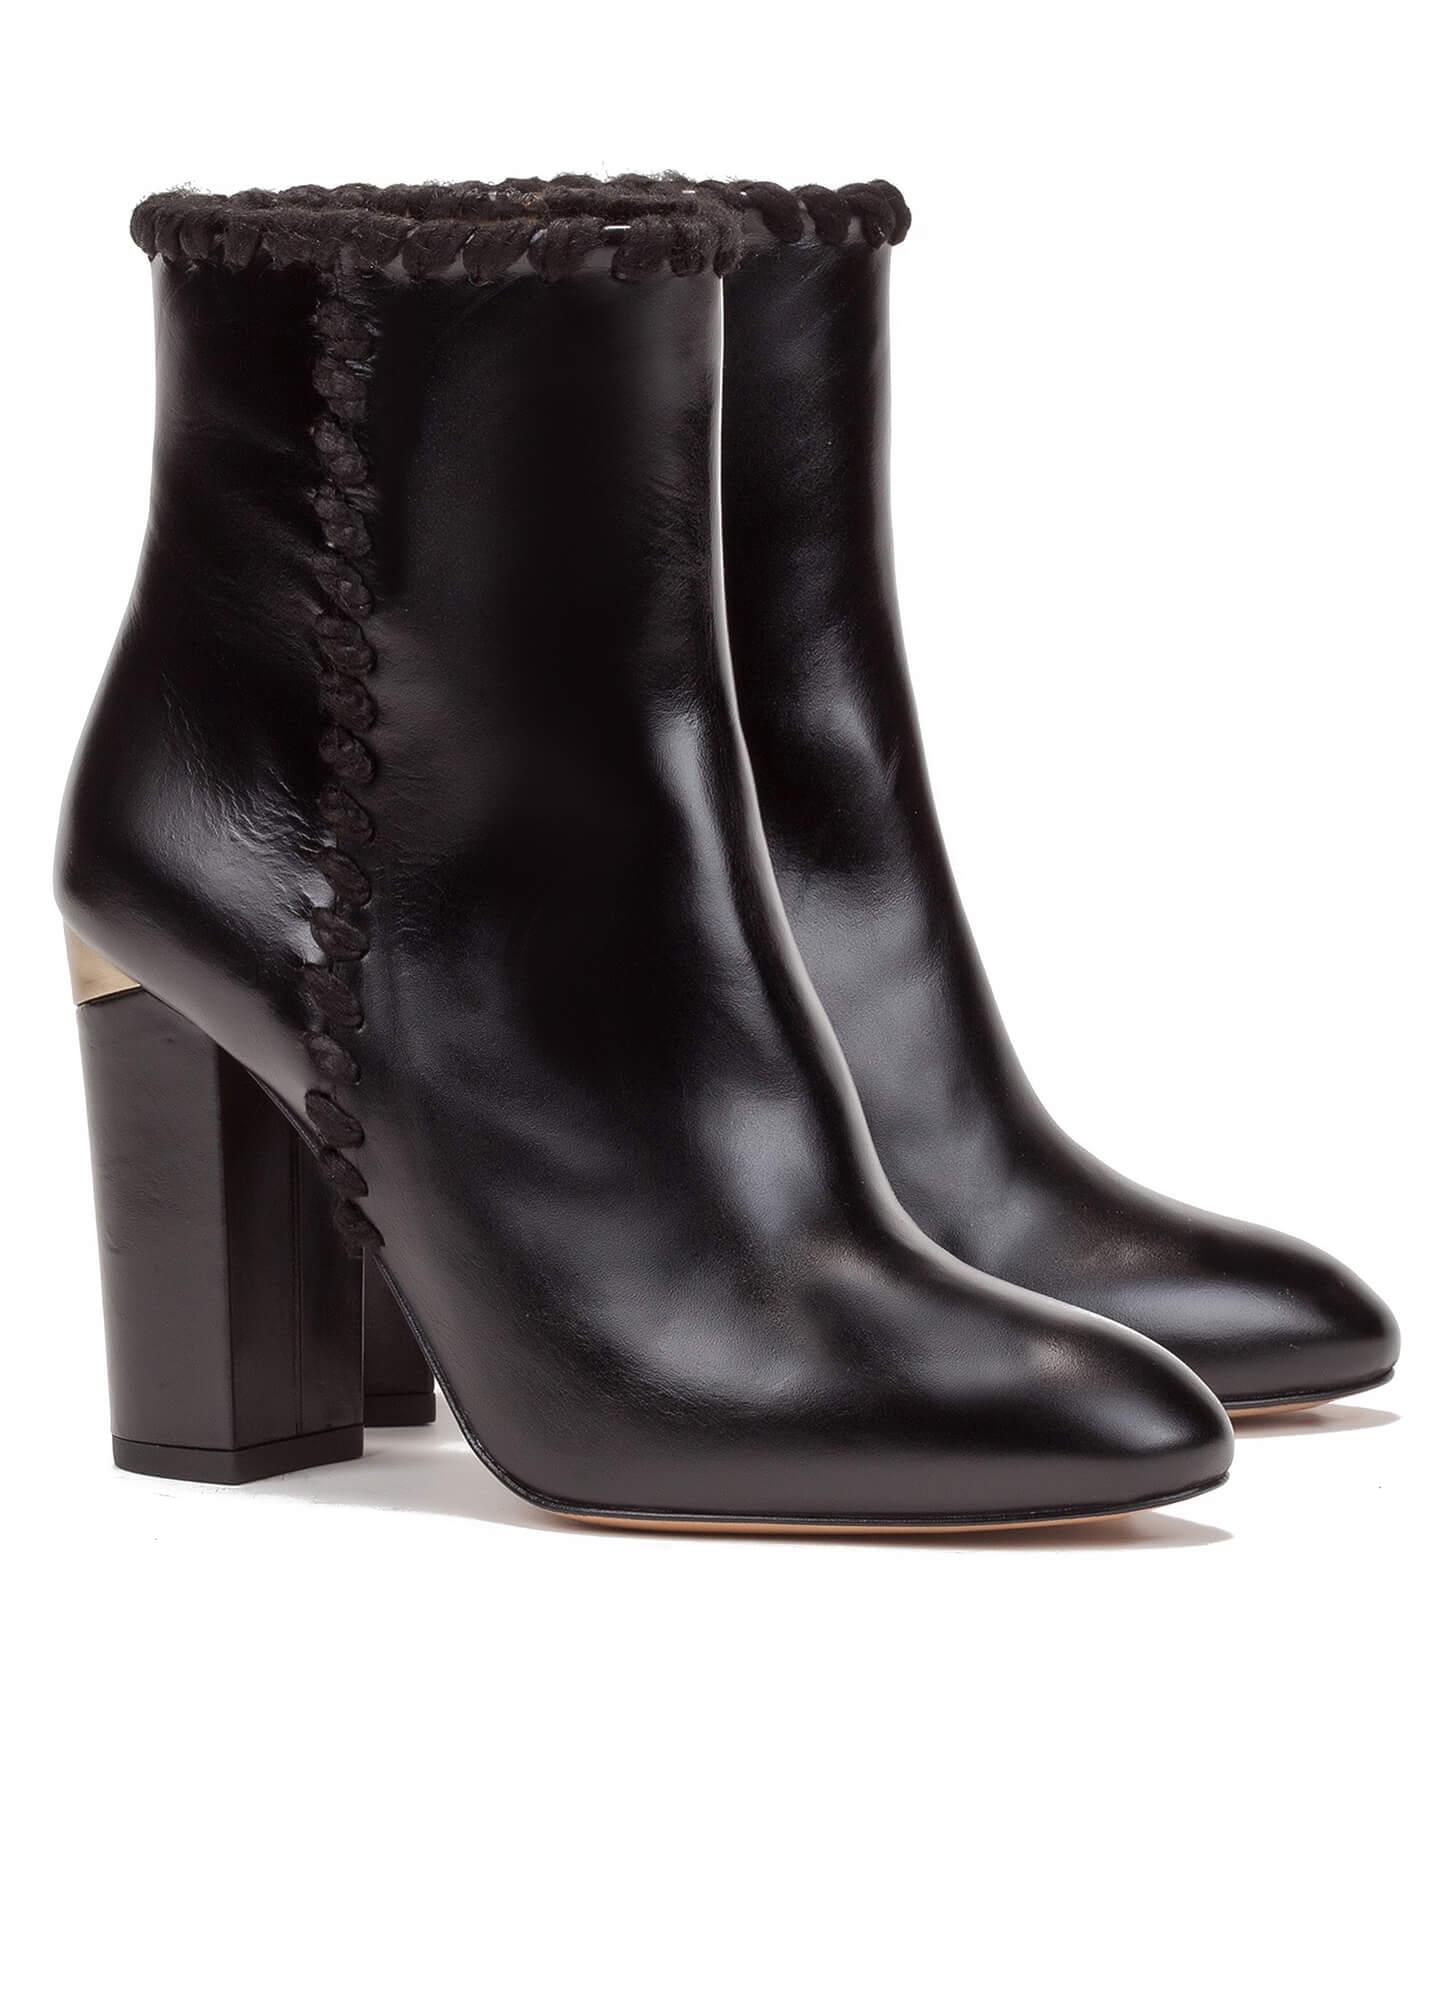 9075e18ddb25 Black high block heel ankle boots - online shoe store Pura Lopez ...